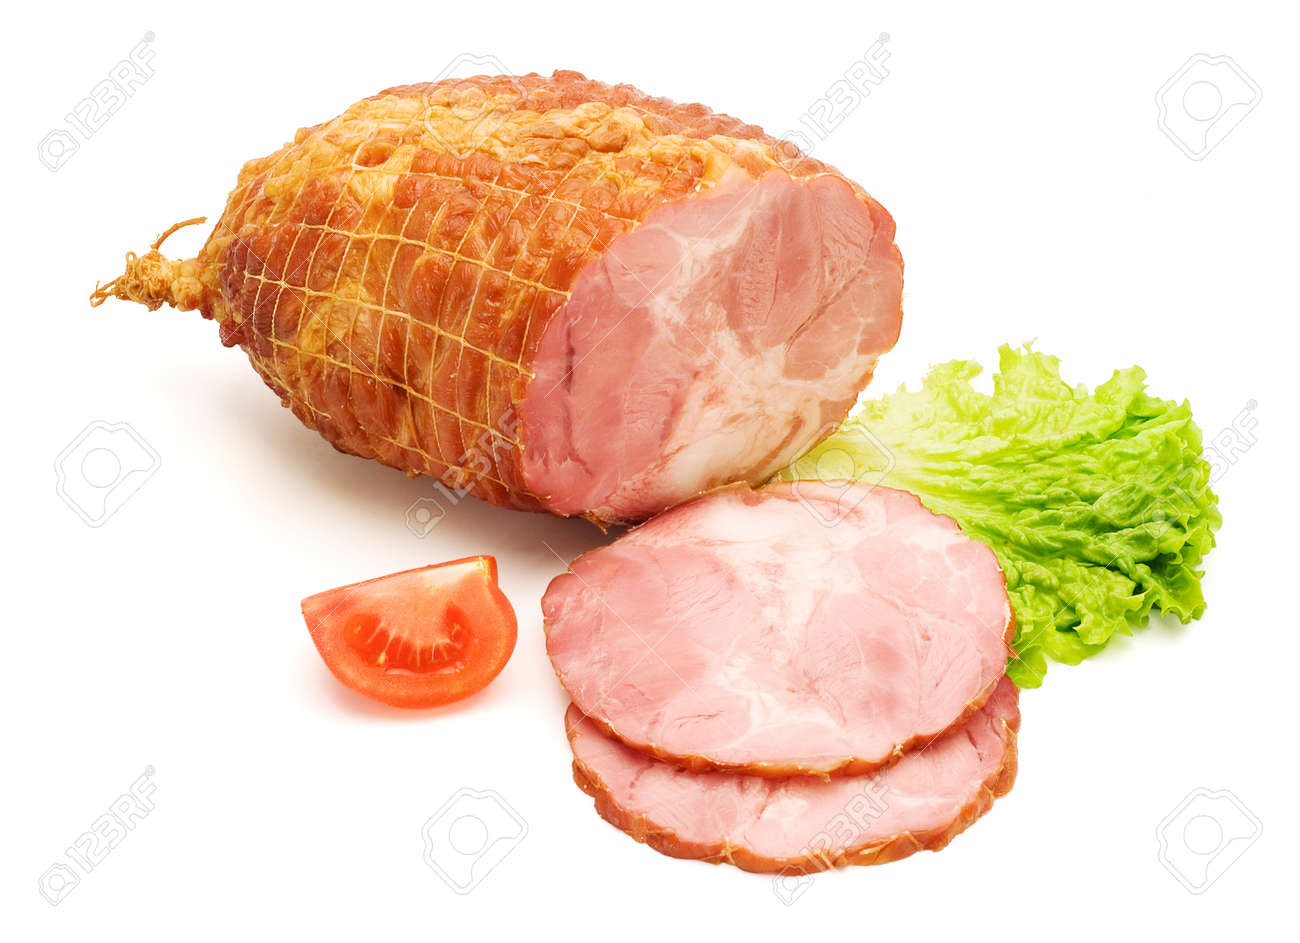 Sliced boneless and tied ham on white background Stock Photo - 16059559